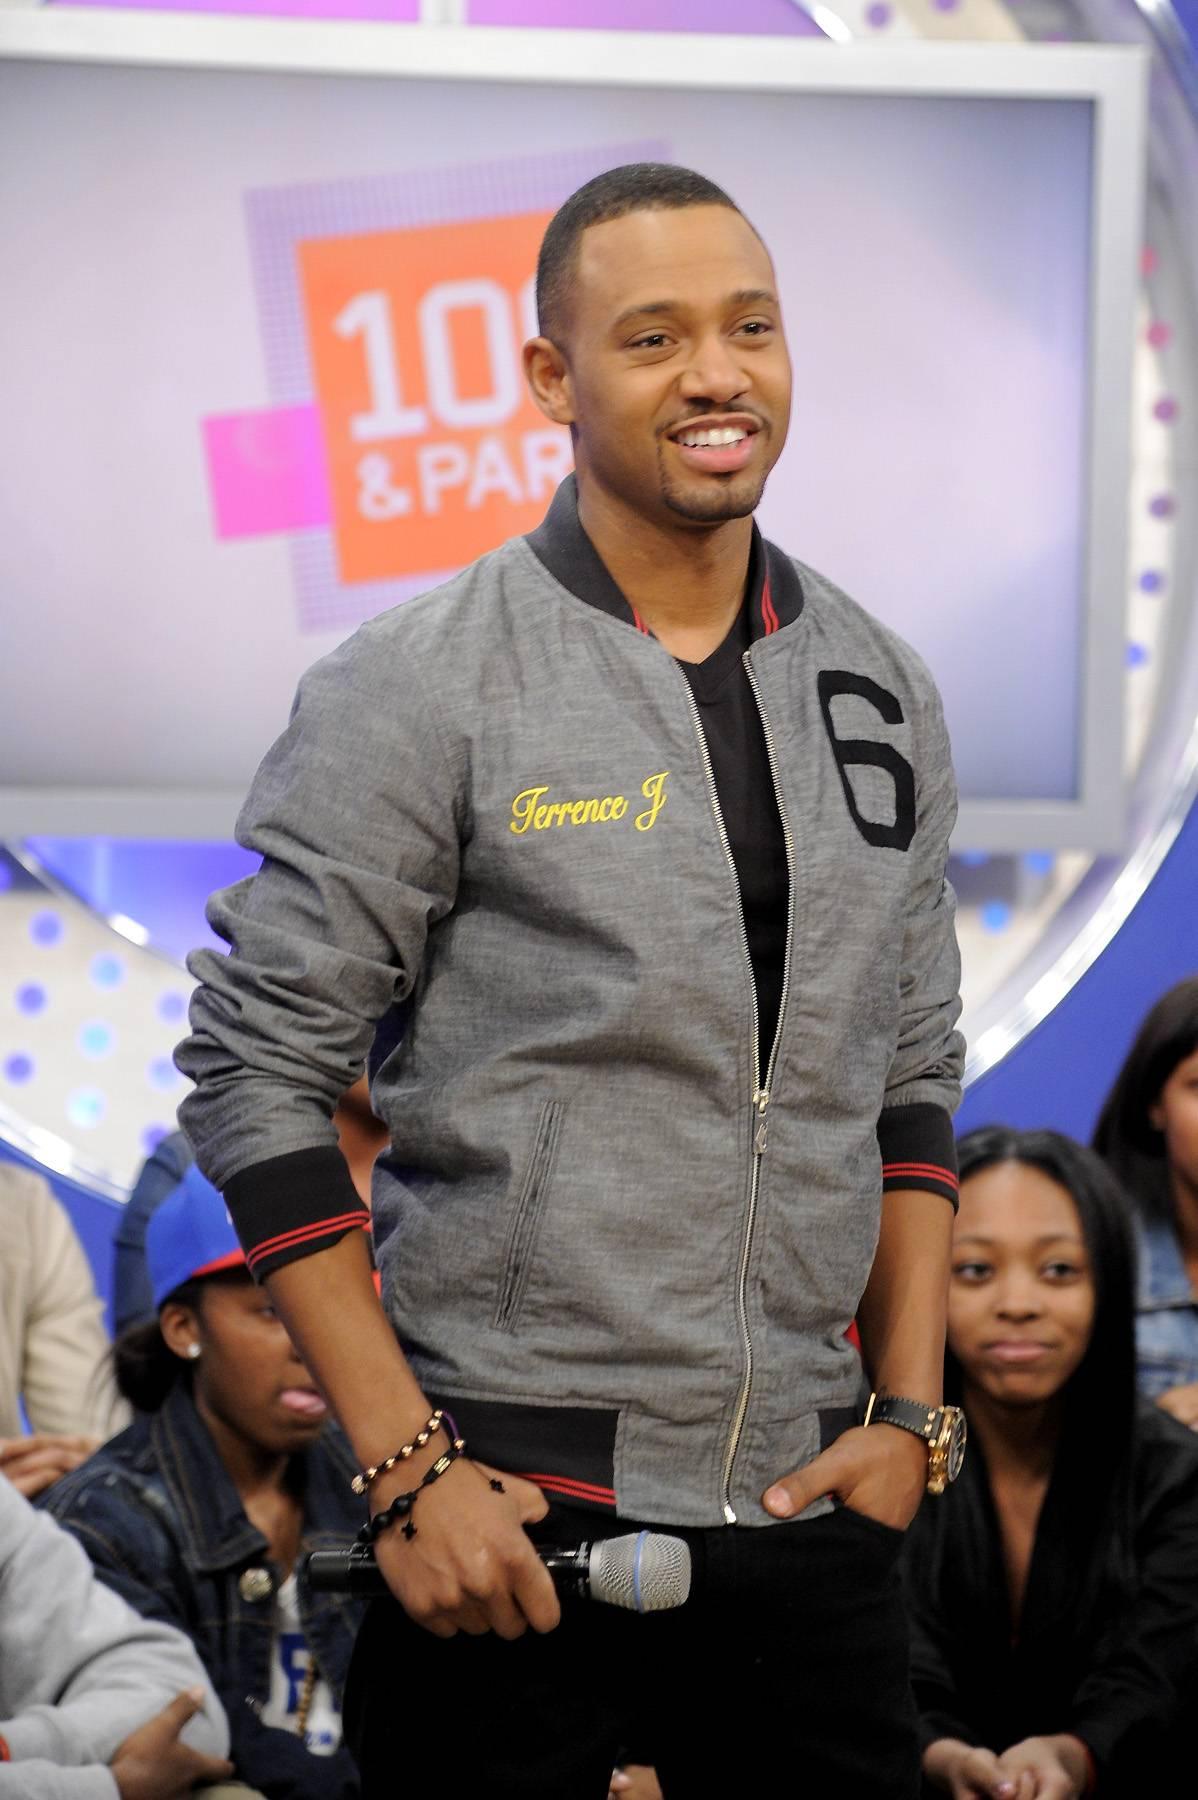 Let's Go - Terrence J at 106 & Park, April 9, 2012. (photo: John Ricard / BET)